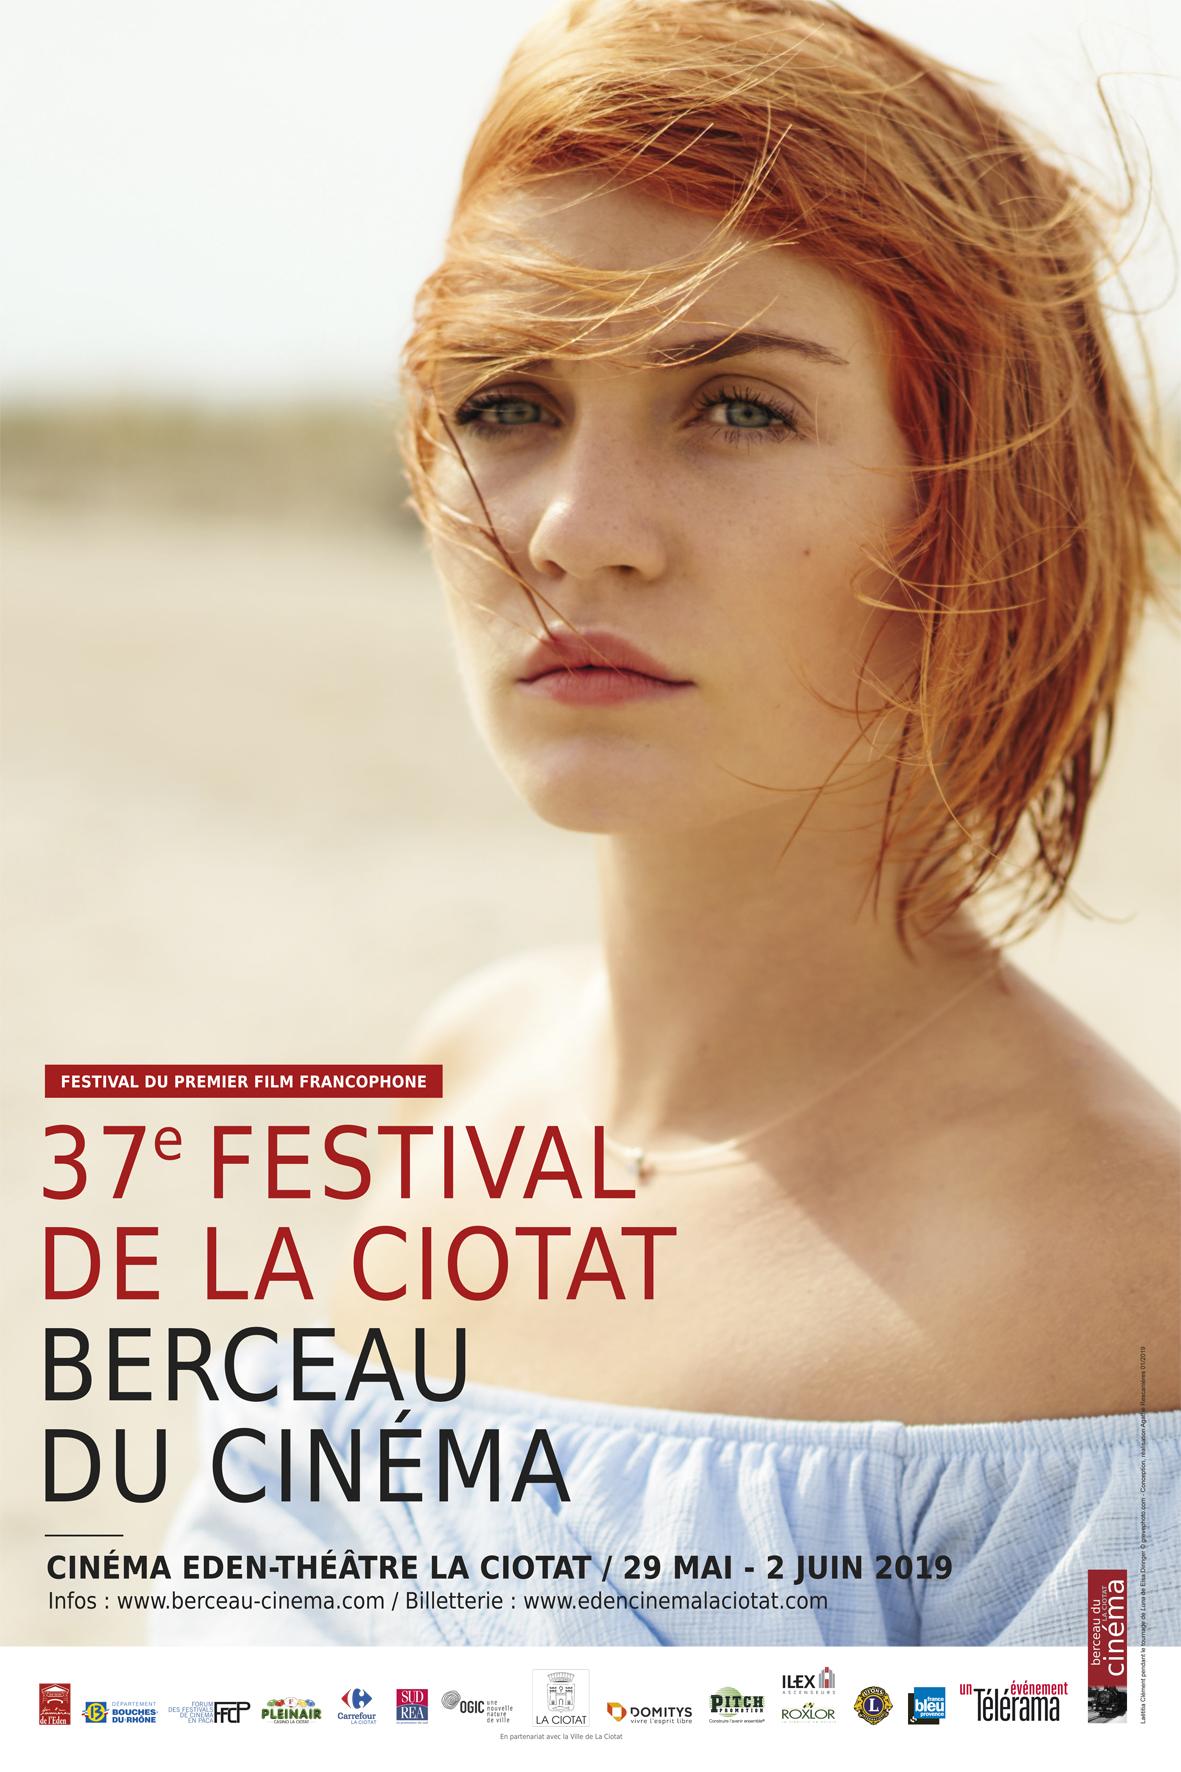 Affiche du festival du premier film francophone